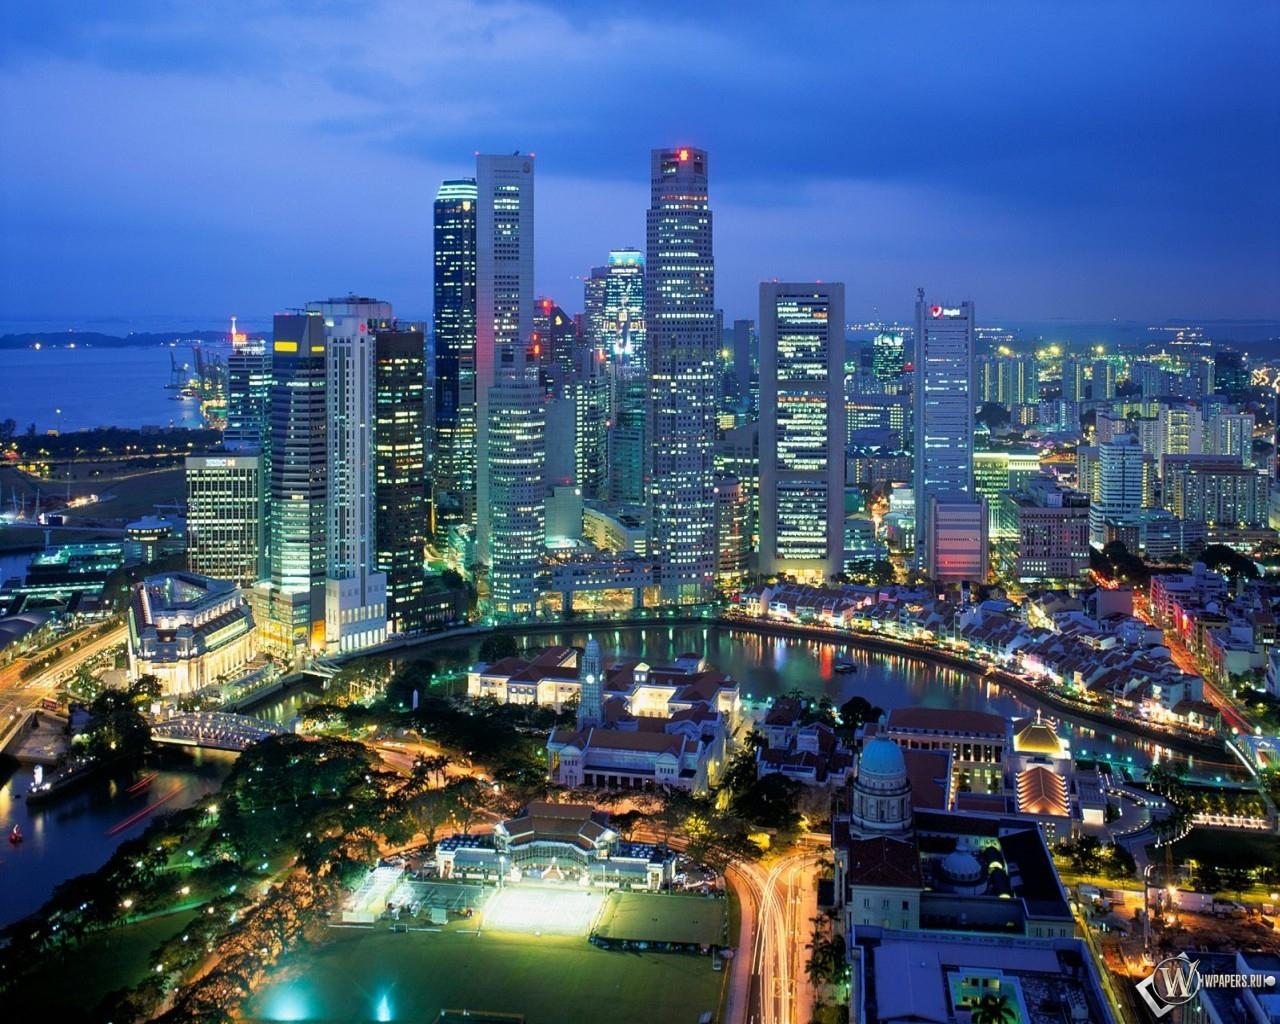 Aerial View - Singapore 1280x1024